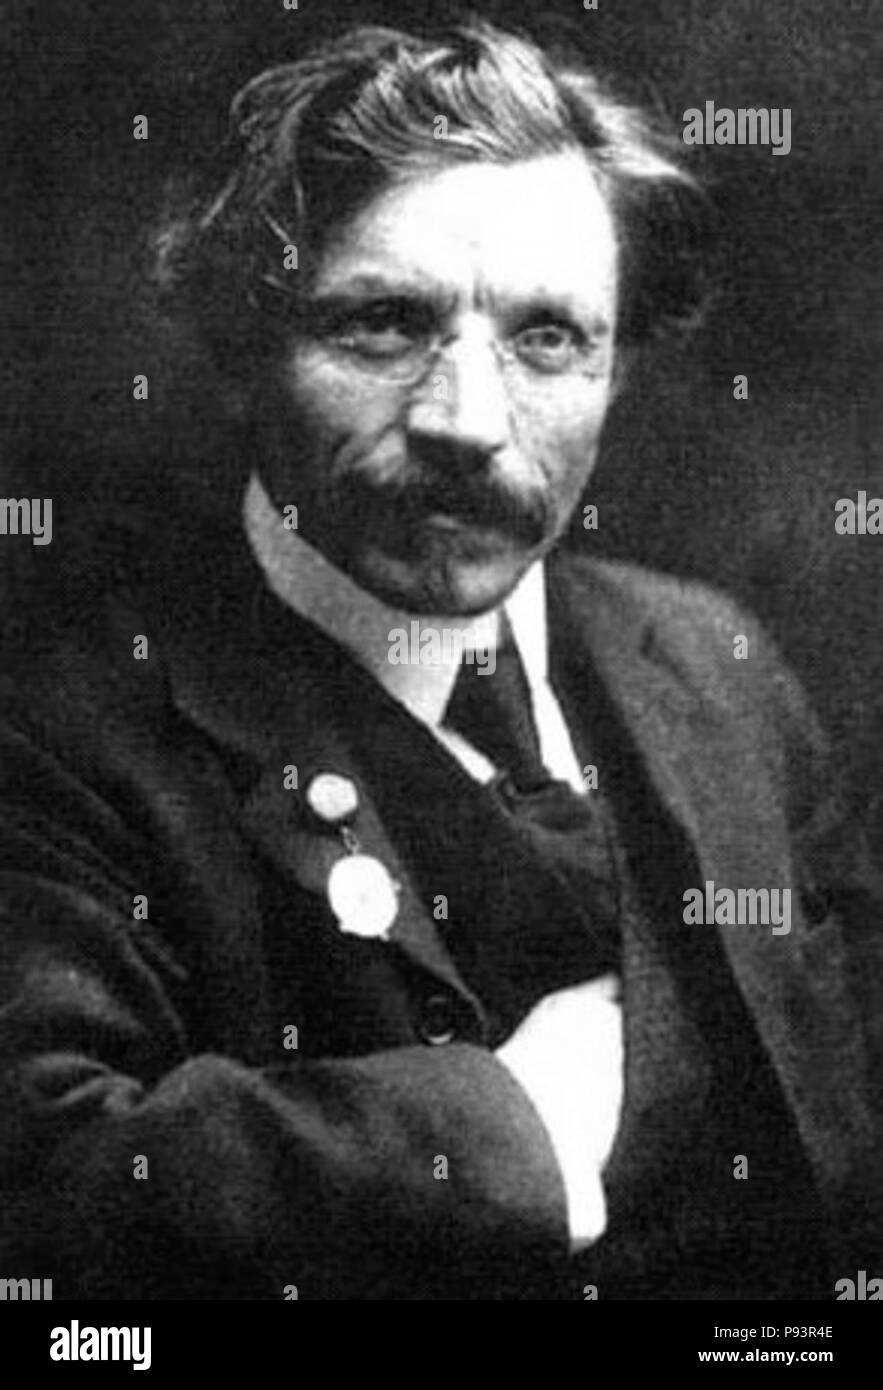 Sholem Aleichem - Stock Image